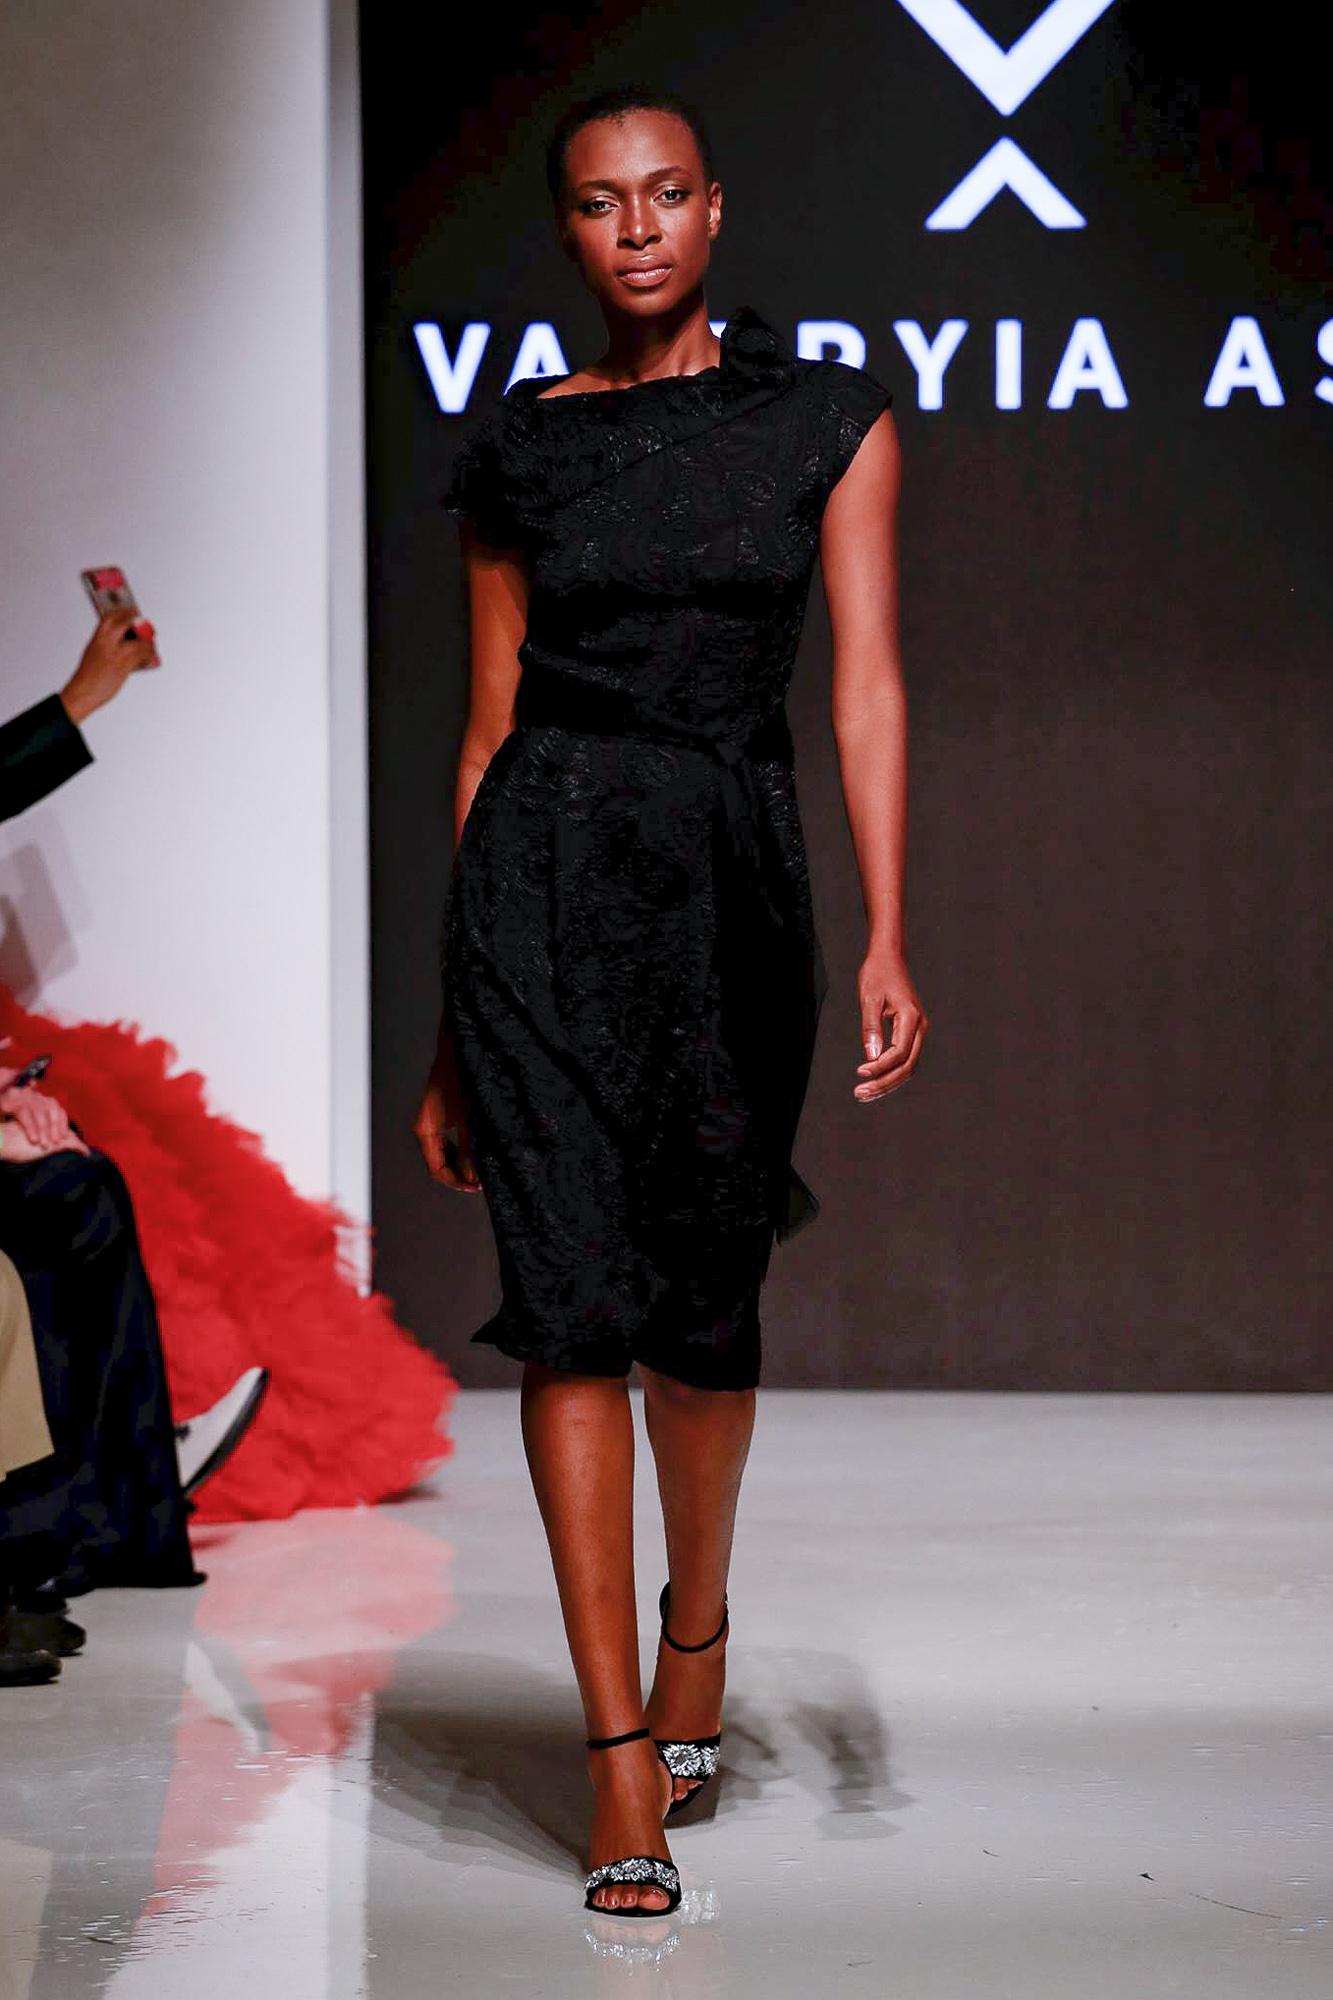 Valeryia As Ad fashion show, Arab Fashion Week collection Spring Summer 2020 in Dubai